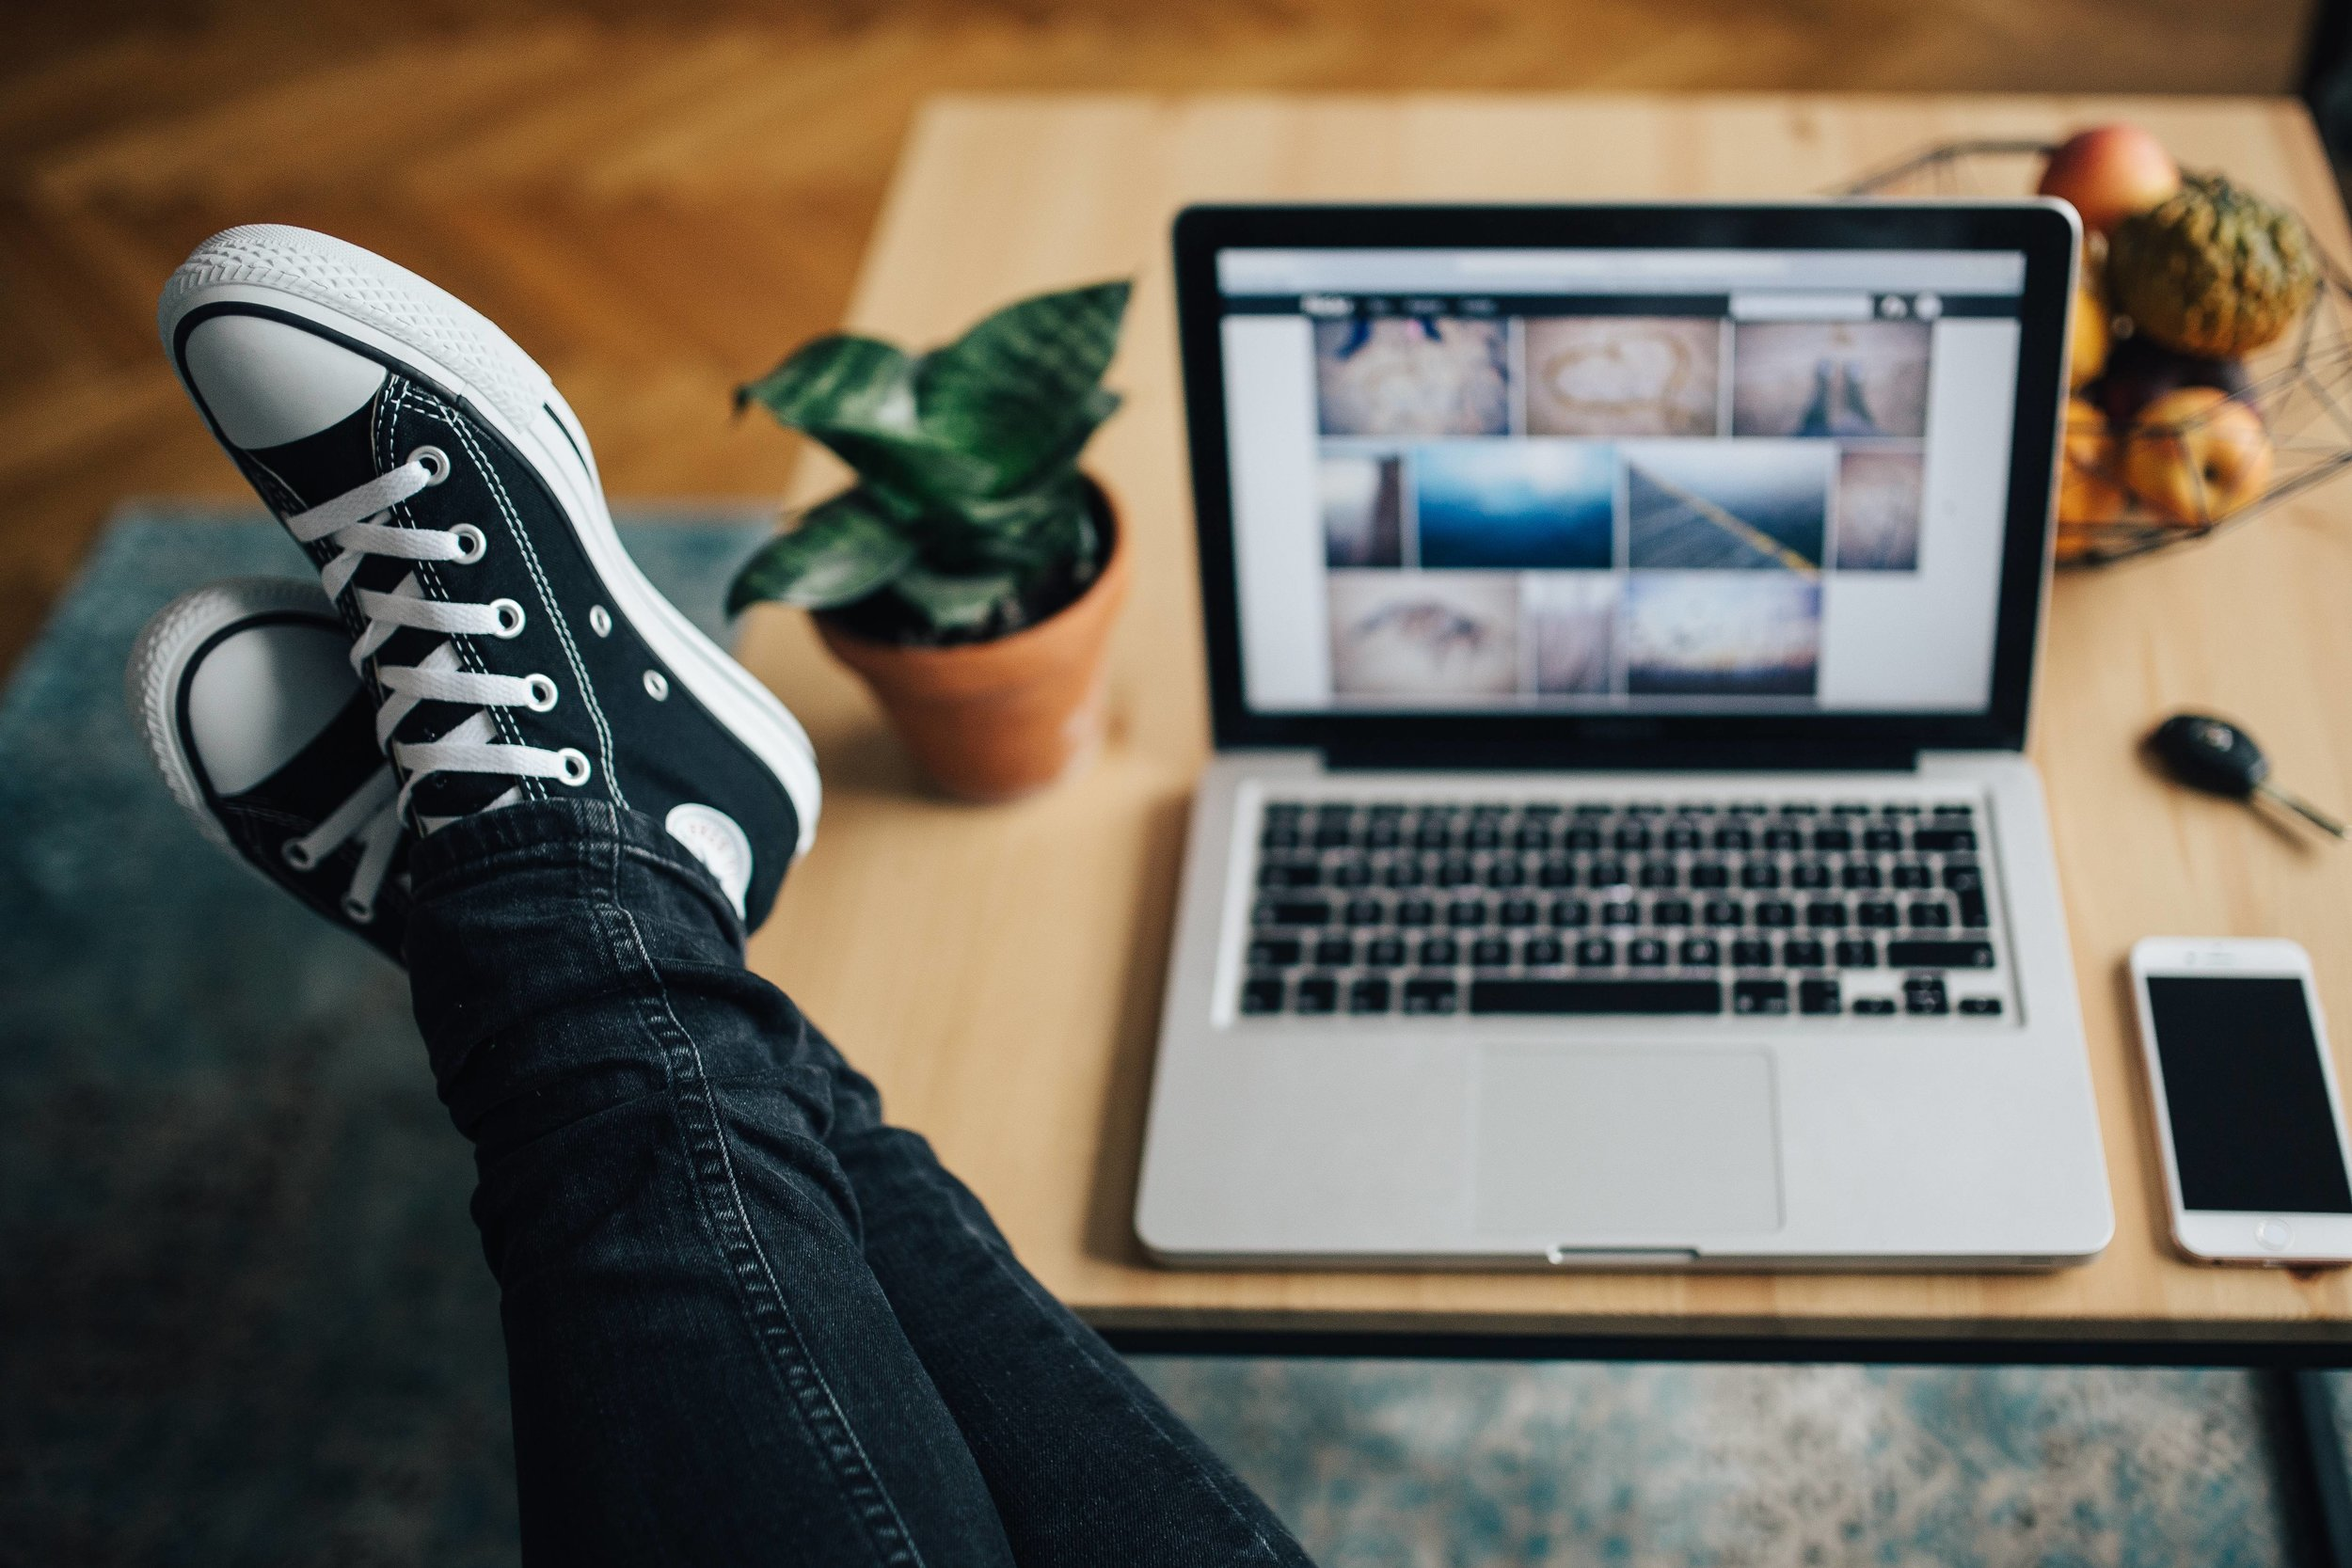 >>FREE download<< 5 beginner blogging mistakes and how to avoid them! #bloggingmistakes #bloggingtips #blogitbetter #socialmediatips #blog #blogger #bloggingforbeginners #blogideas #bloggingformoney #freedownload